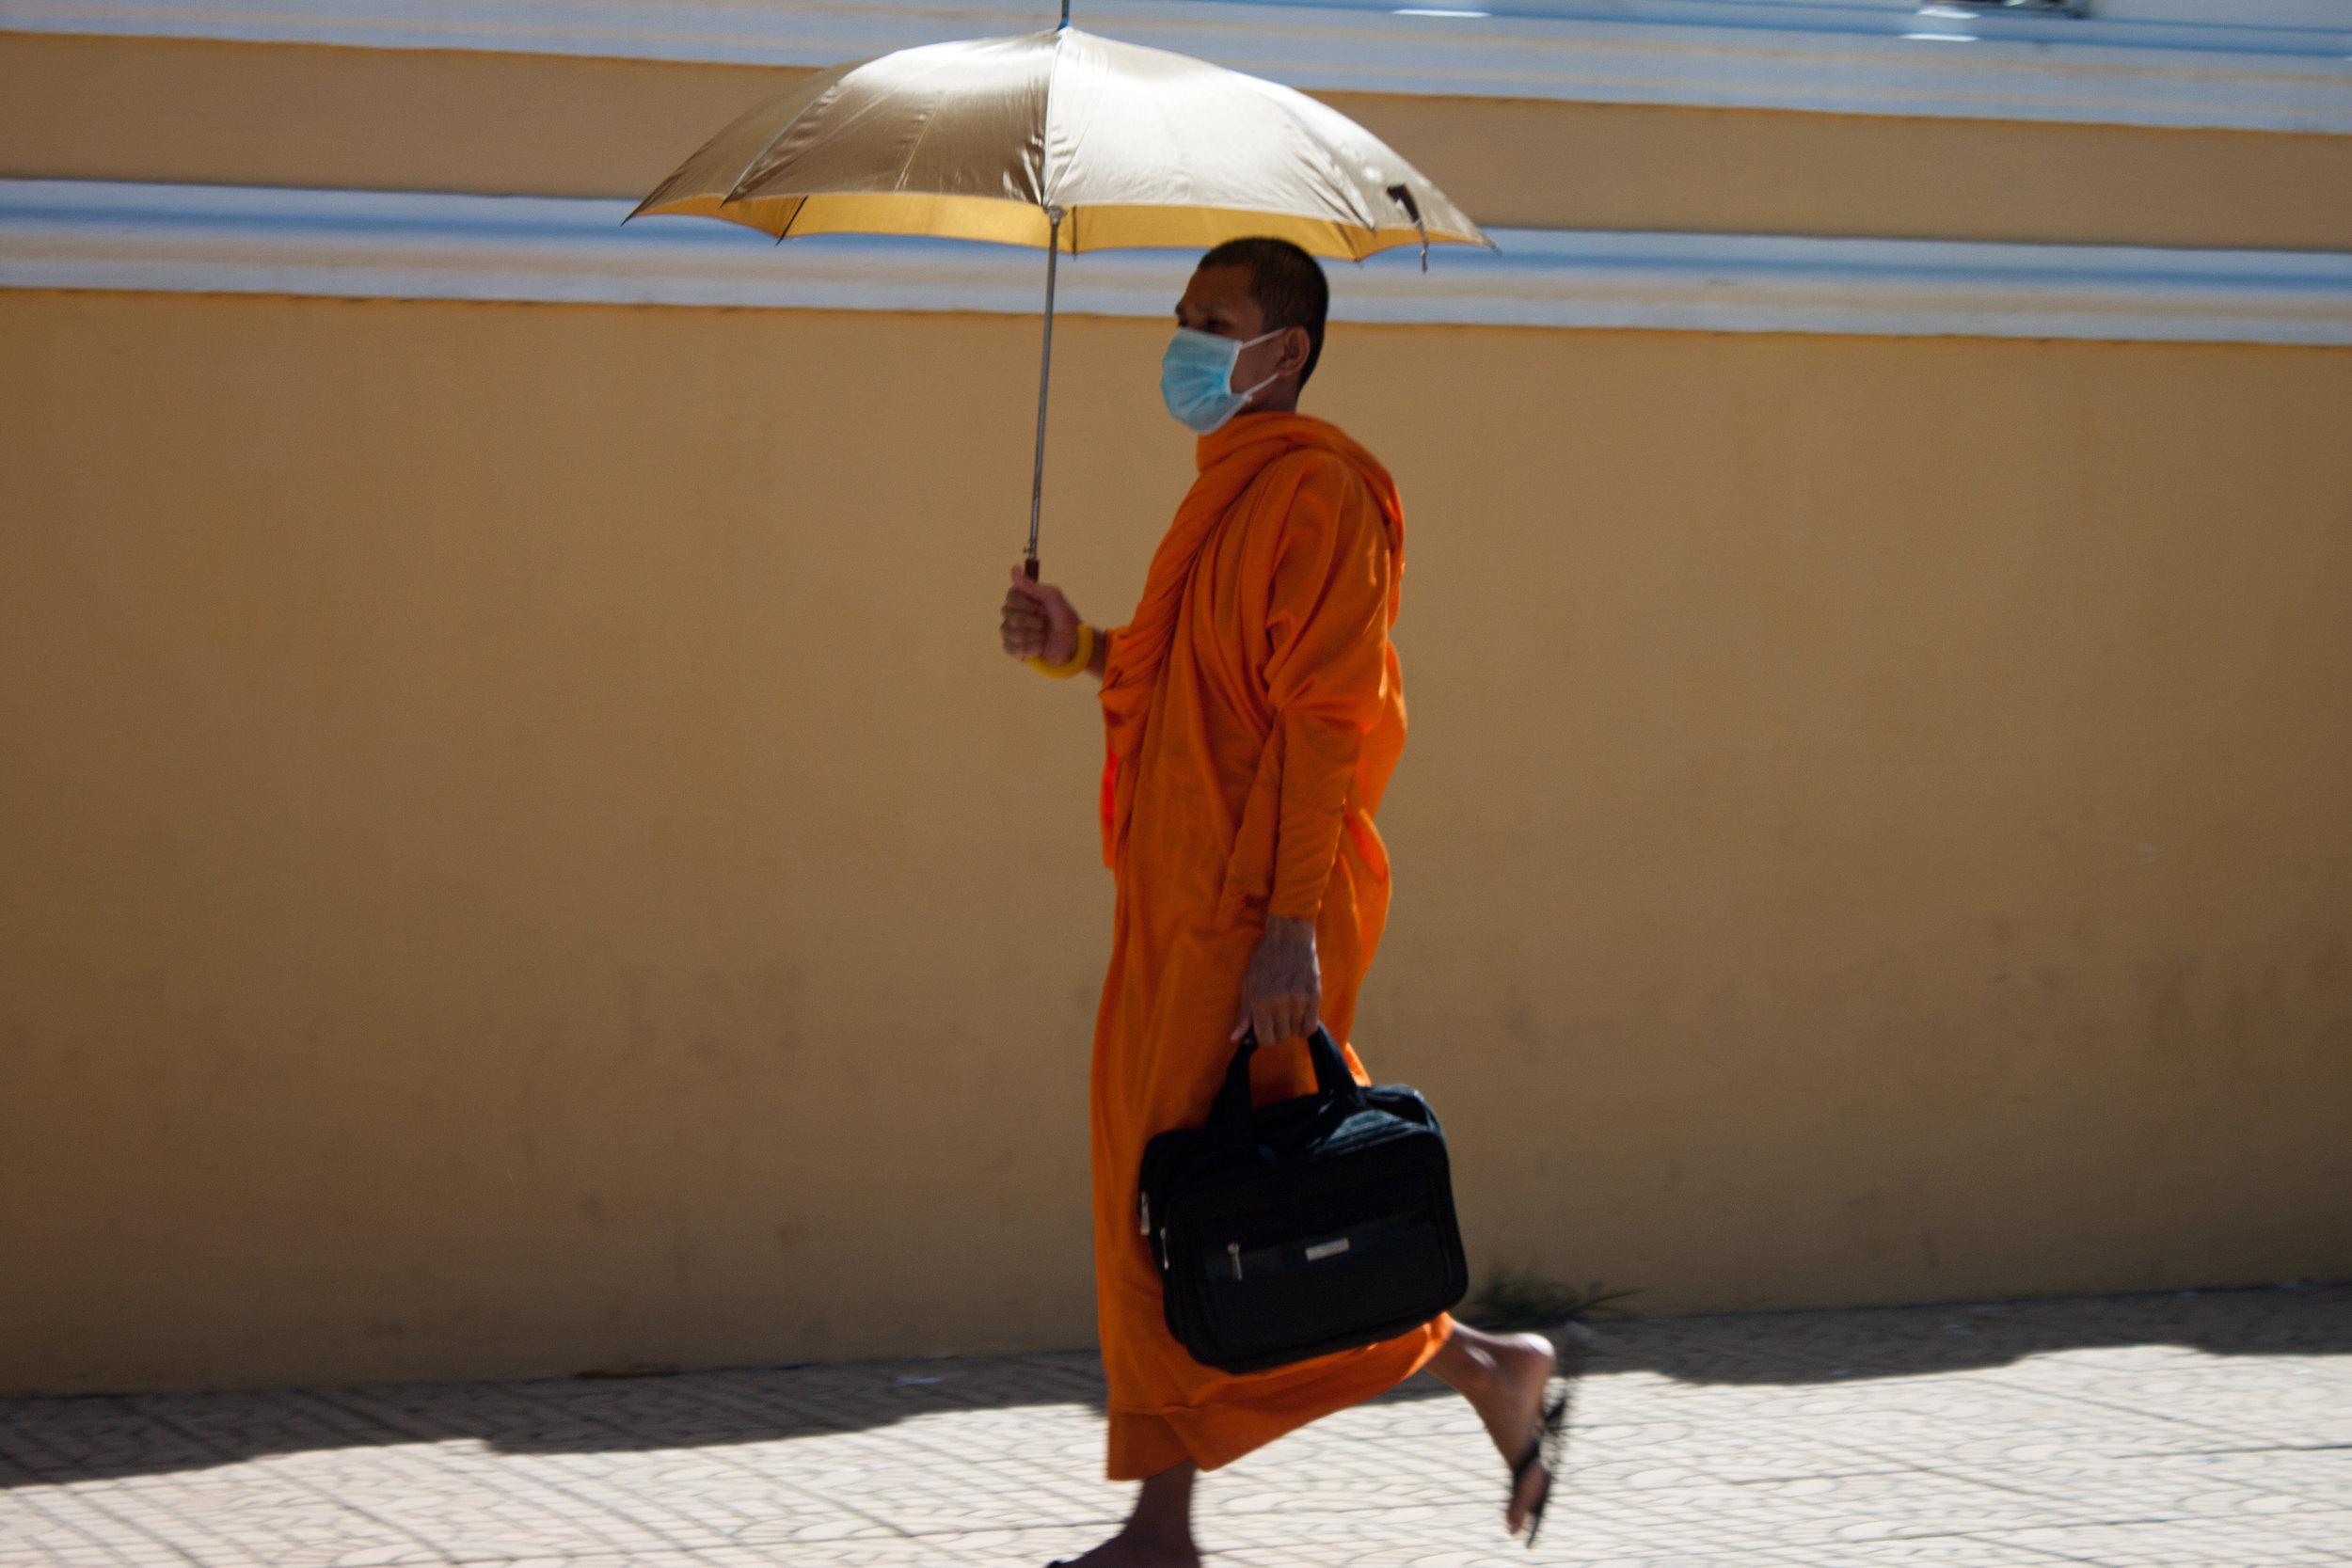 Cambodia - Phnom Penh city and people - Junen 2012 039.jpg